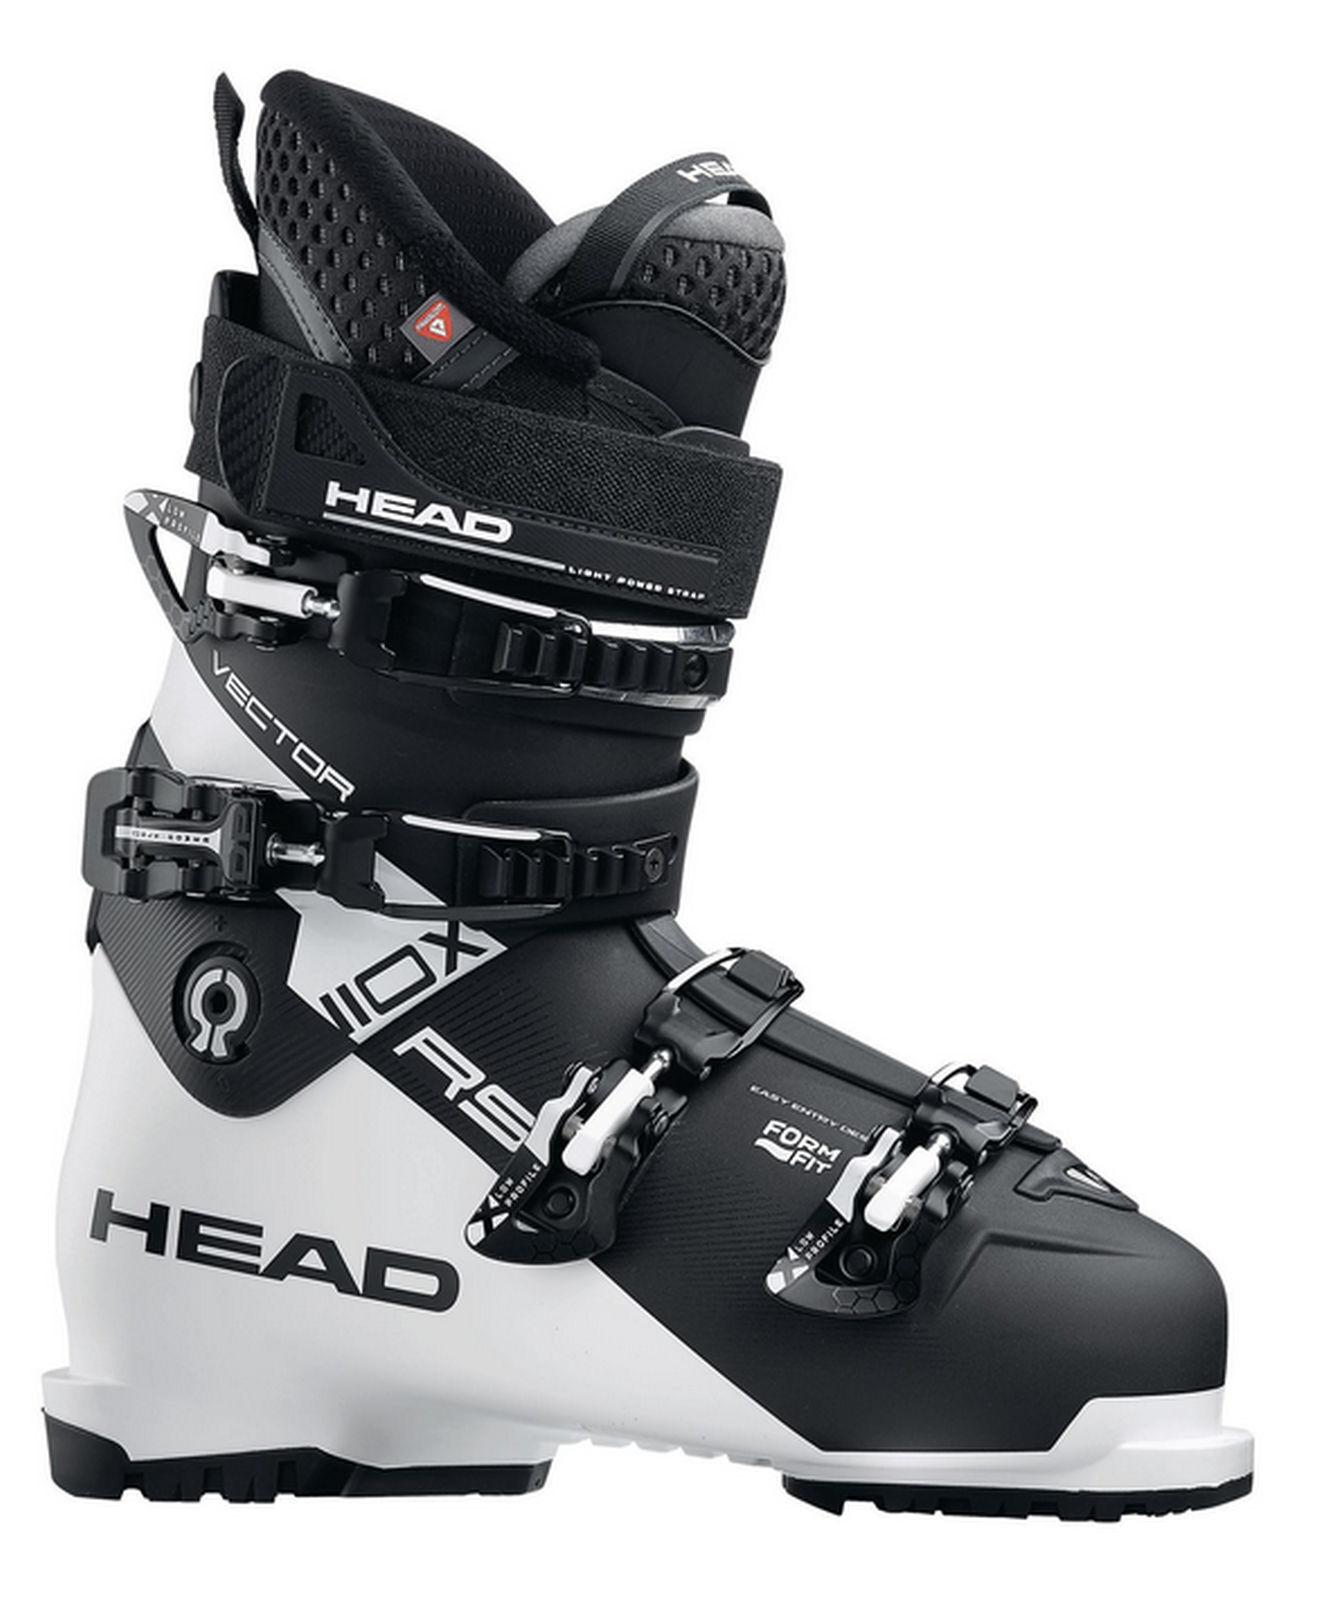 Head Herren Skischuh Ski Schuh VECTOR RS 110 X schwarz weiss